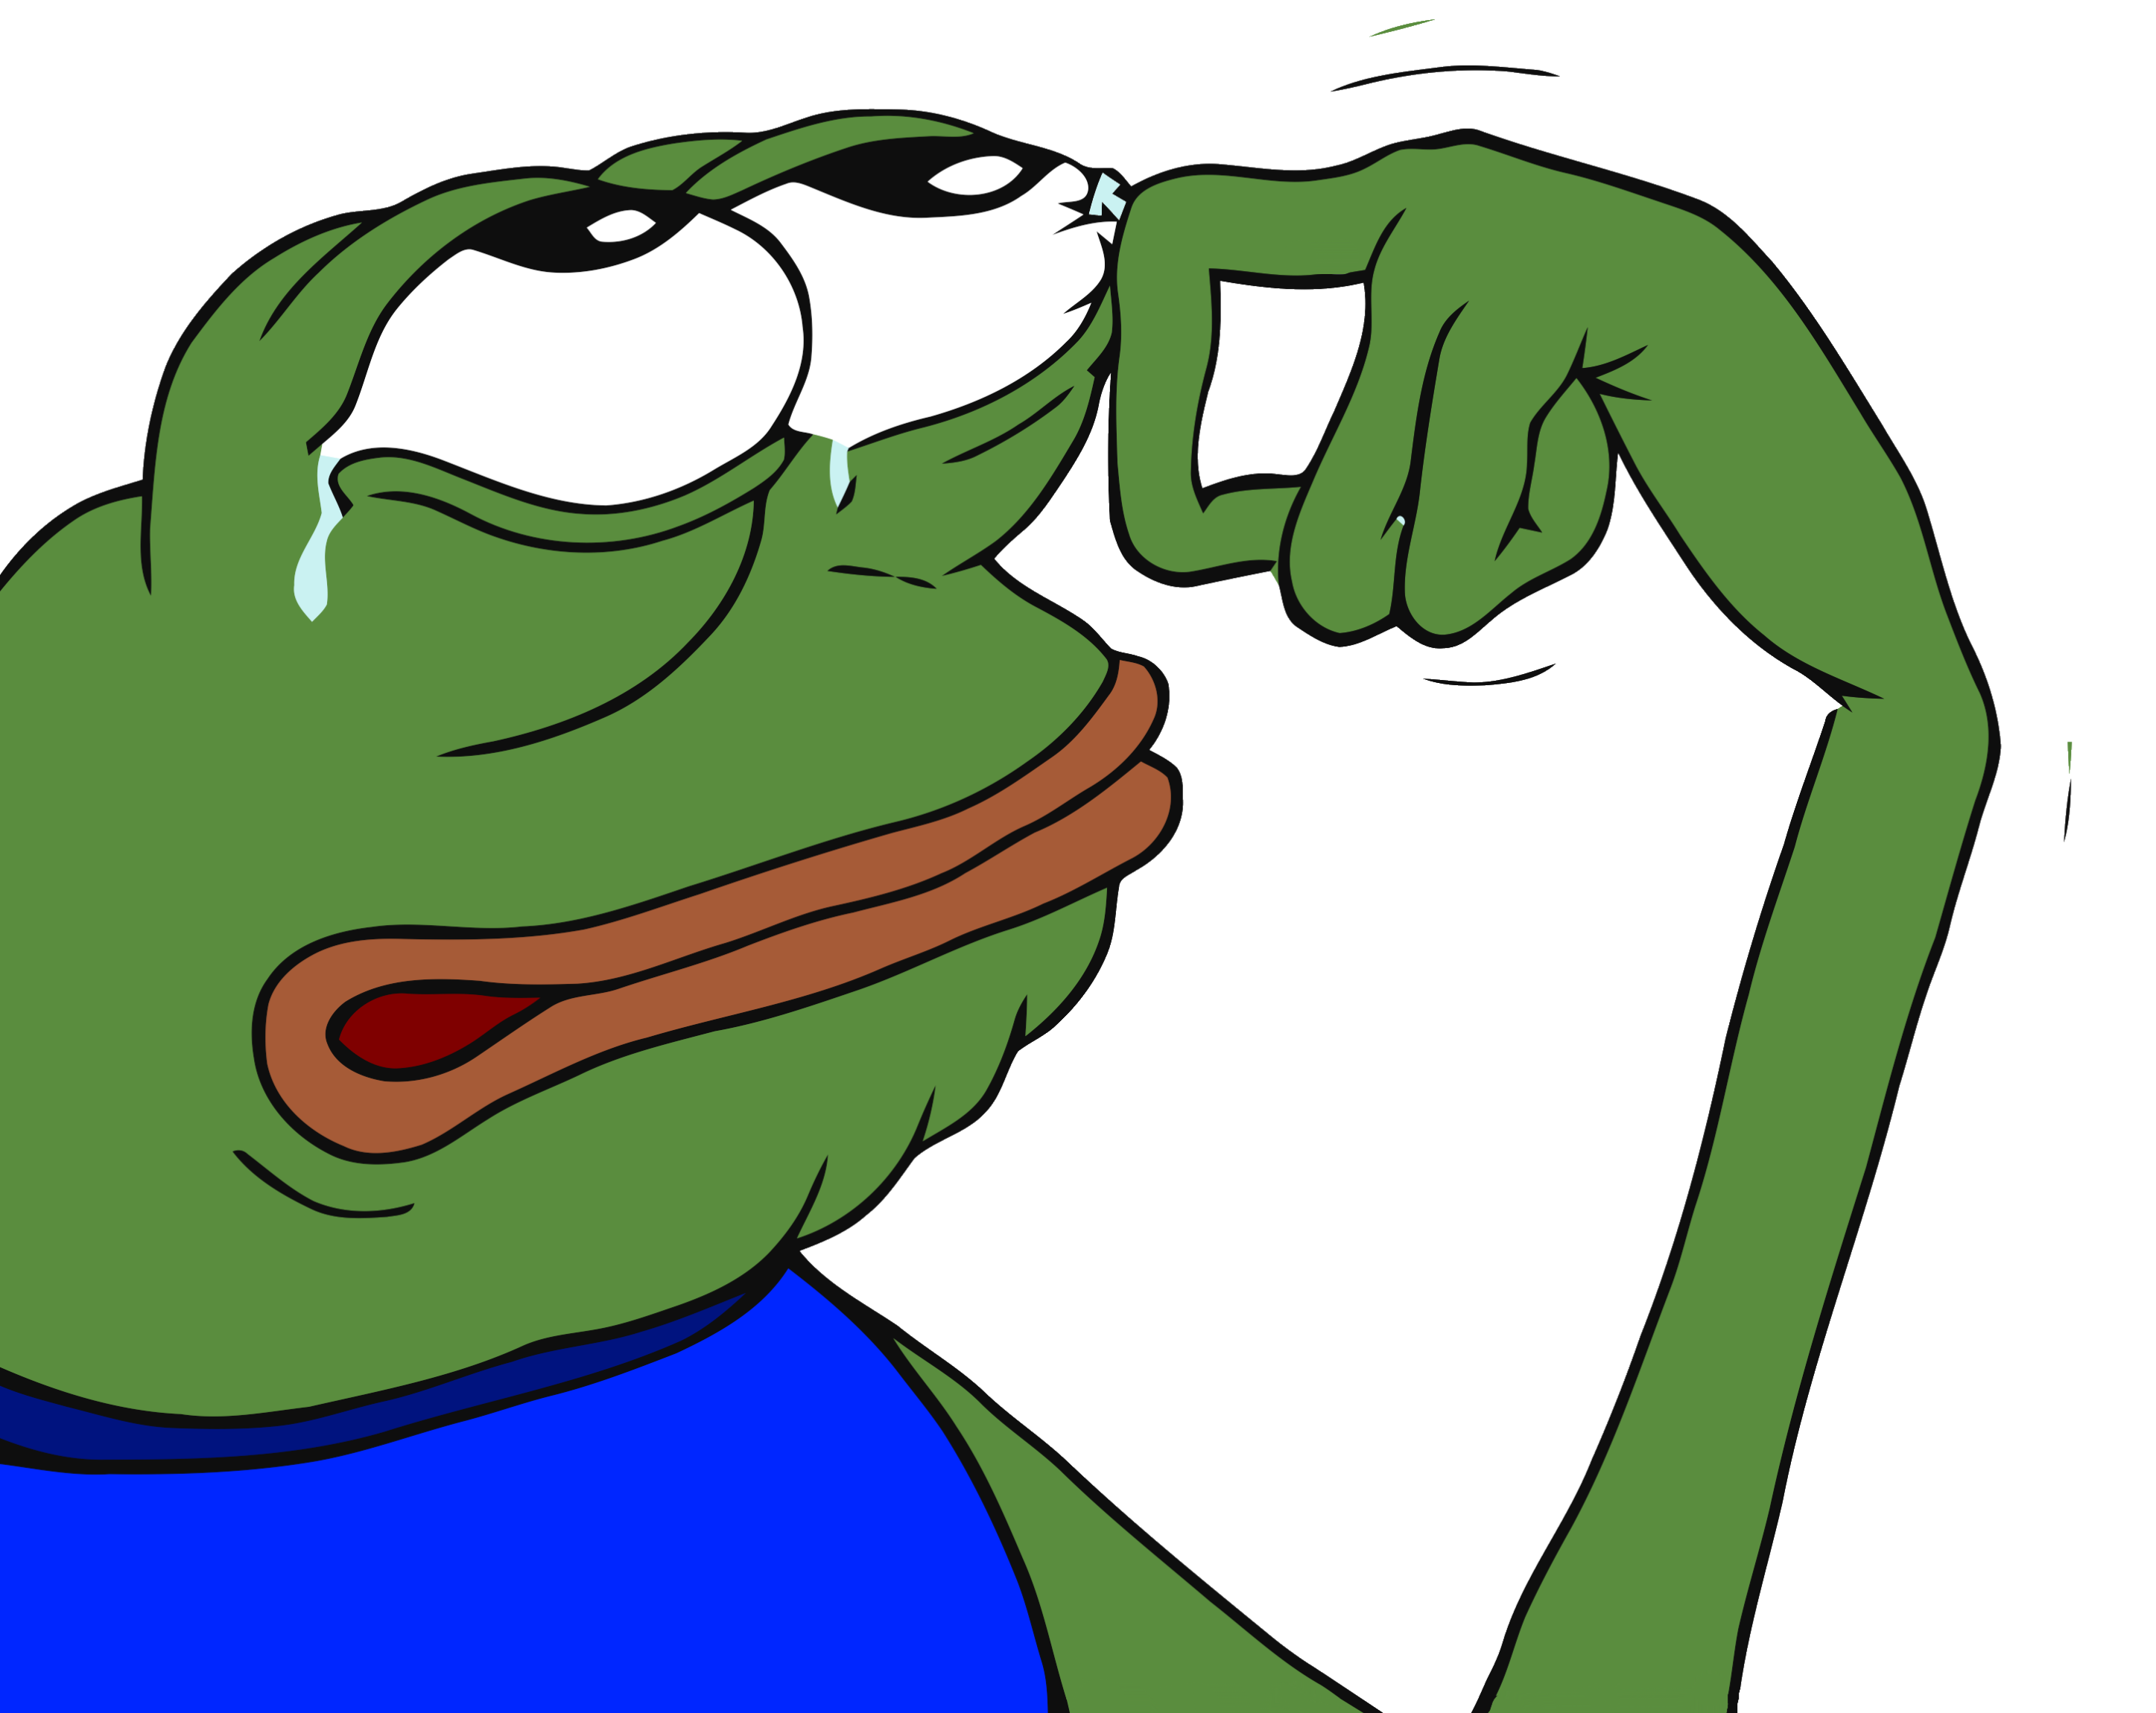 67868839.png 2,894×2,300 pixels Frog meme, Funny phone